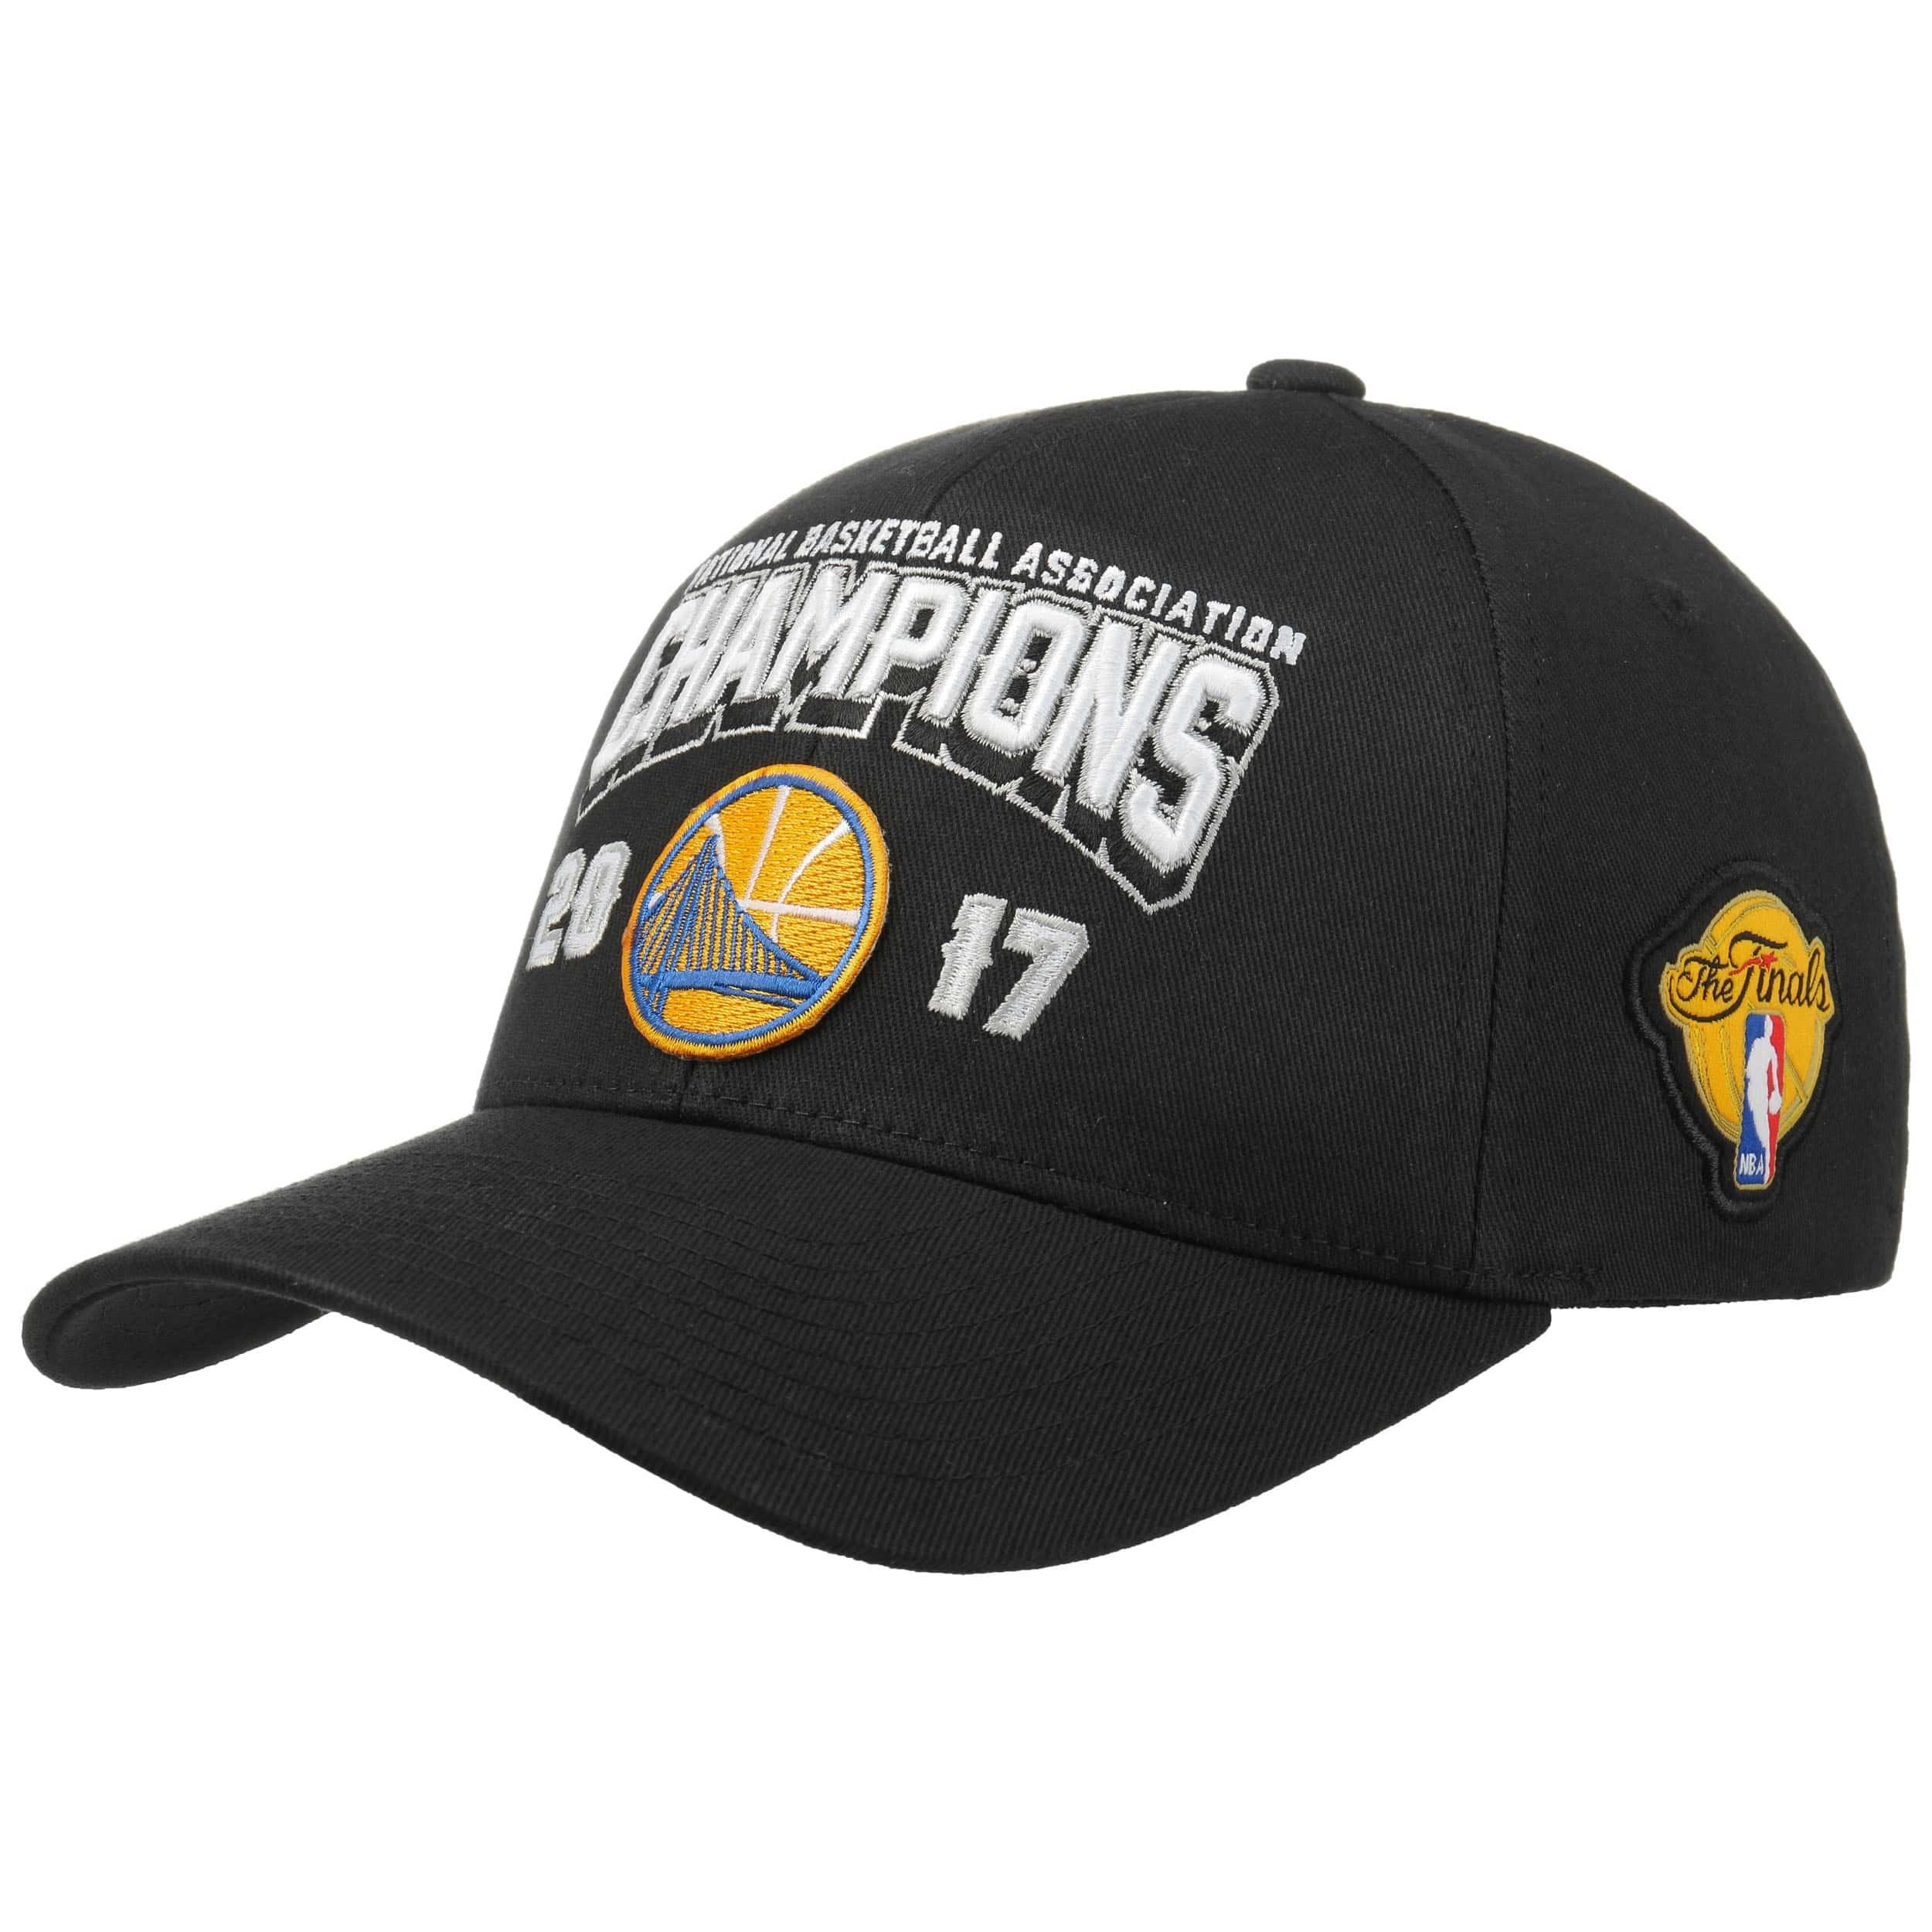 57e56cc546220 Gorra Warriors by Mitchell   Ness - Gorras - sombreroshop.es